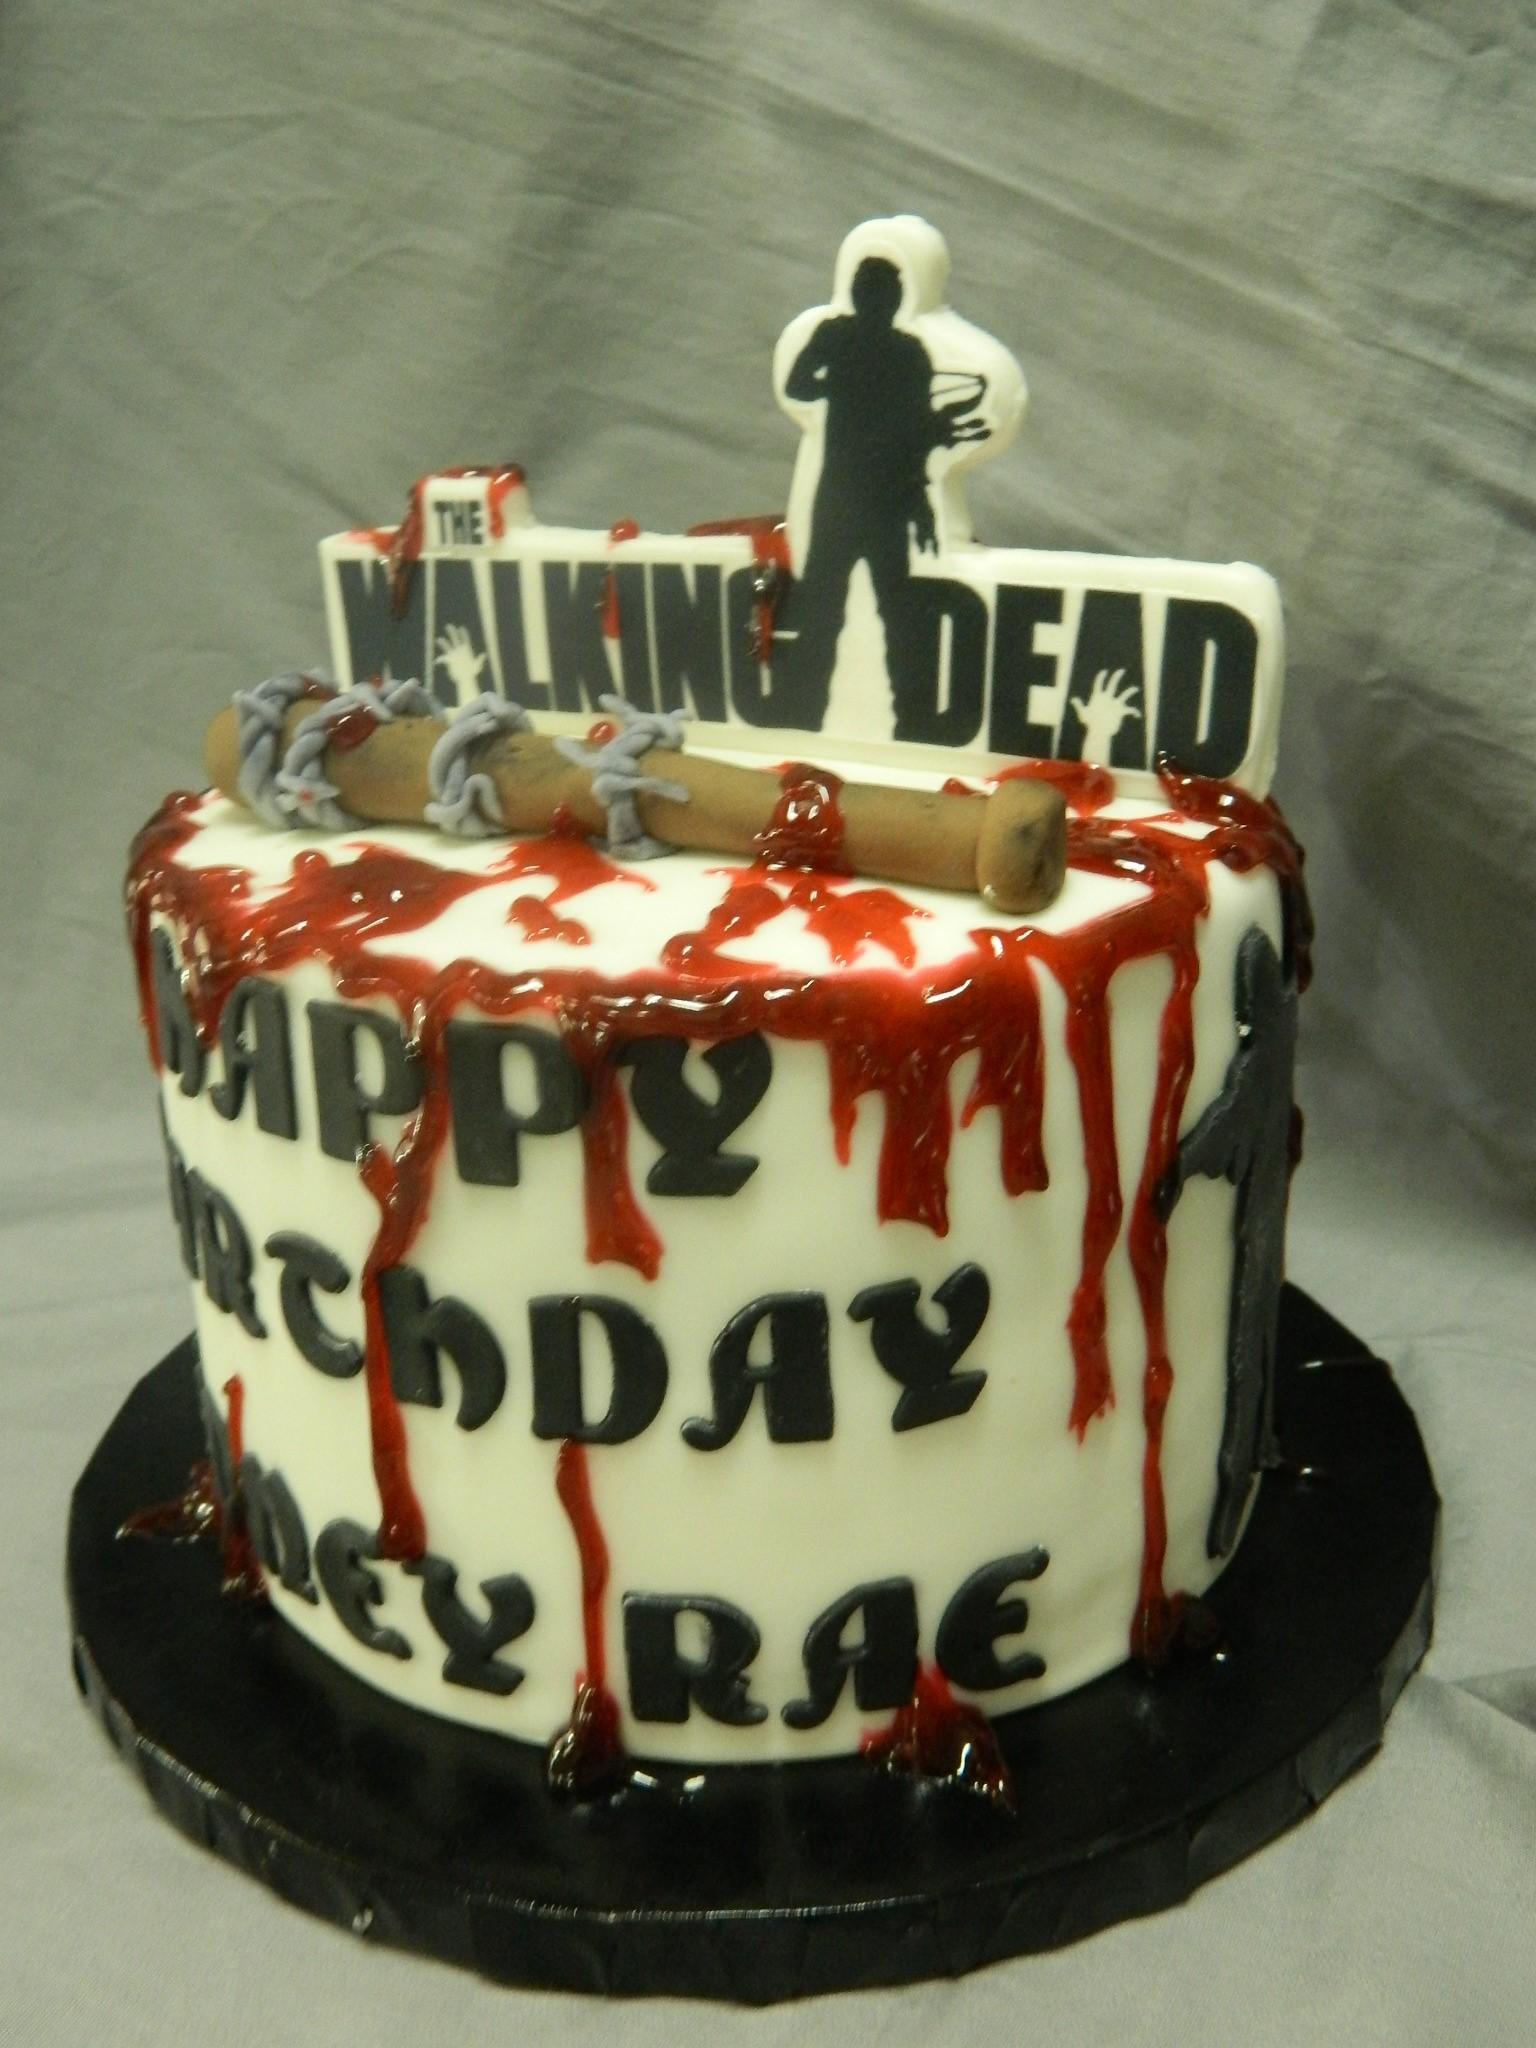 Walking Dead Themed Custom Cake Hey Cupcake